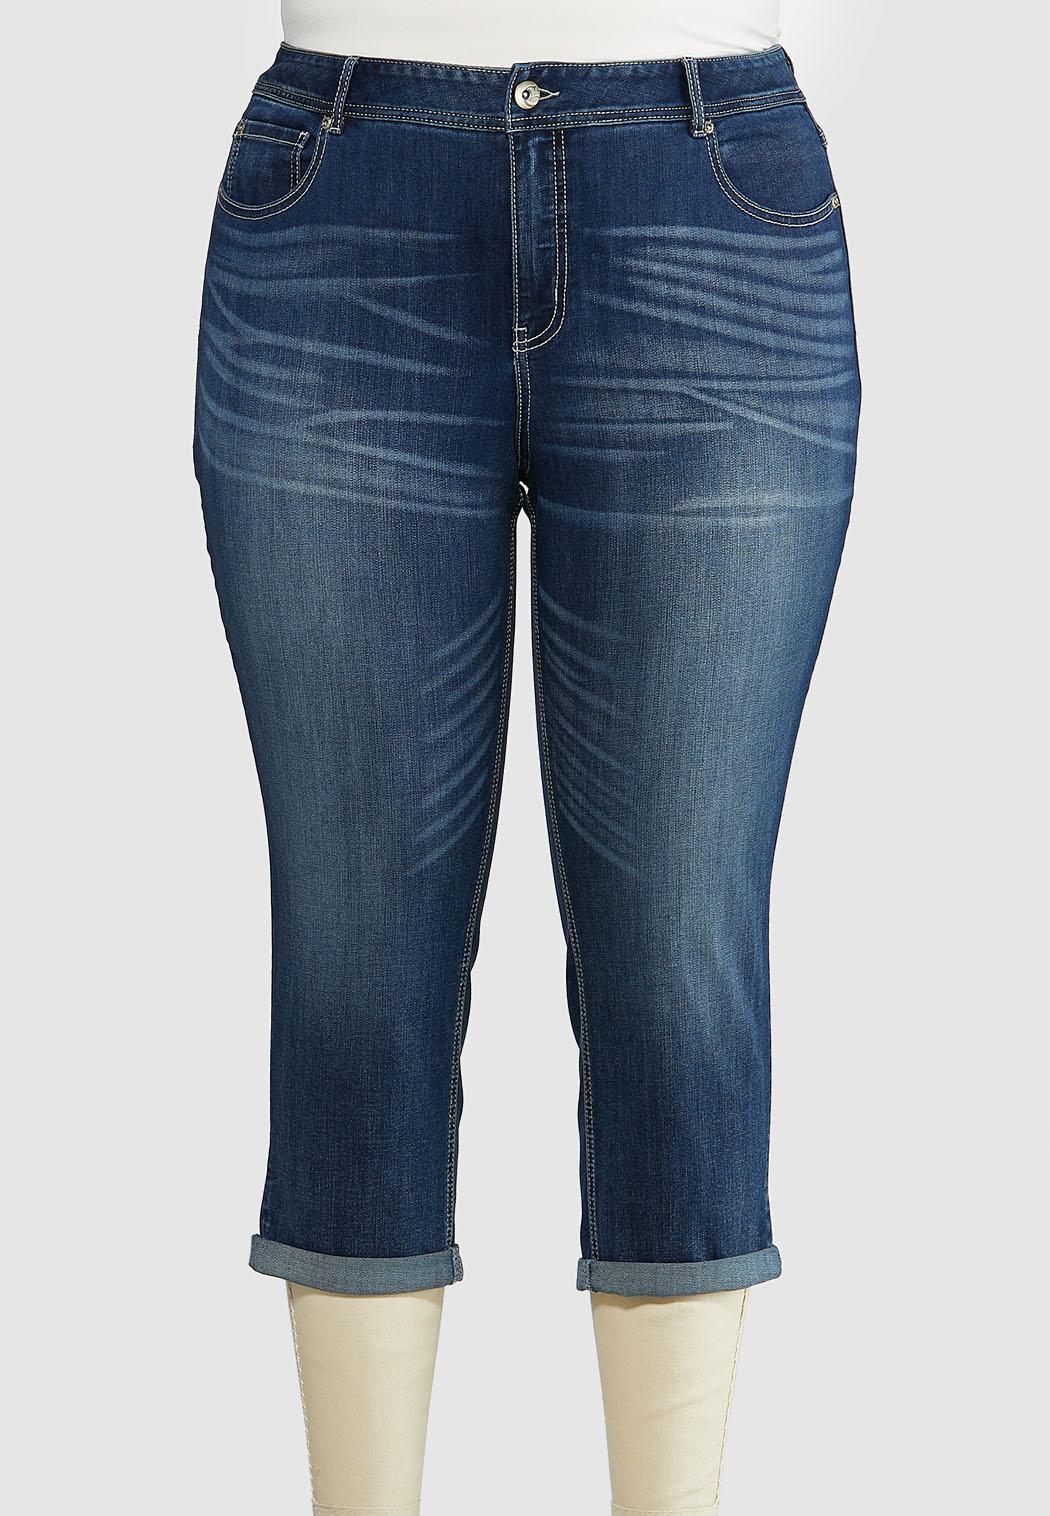 Plus Size Cropped Girlfriend Jeans